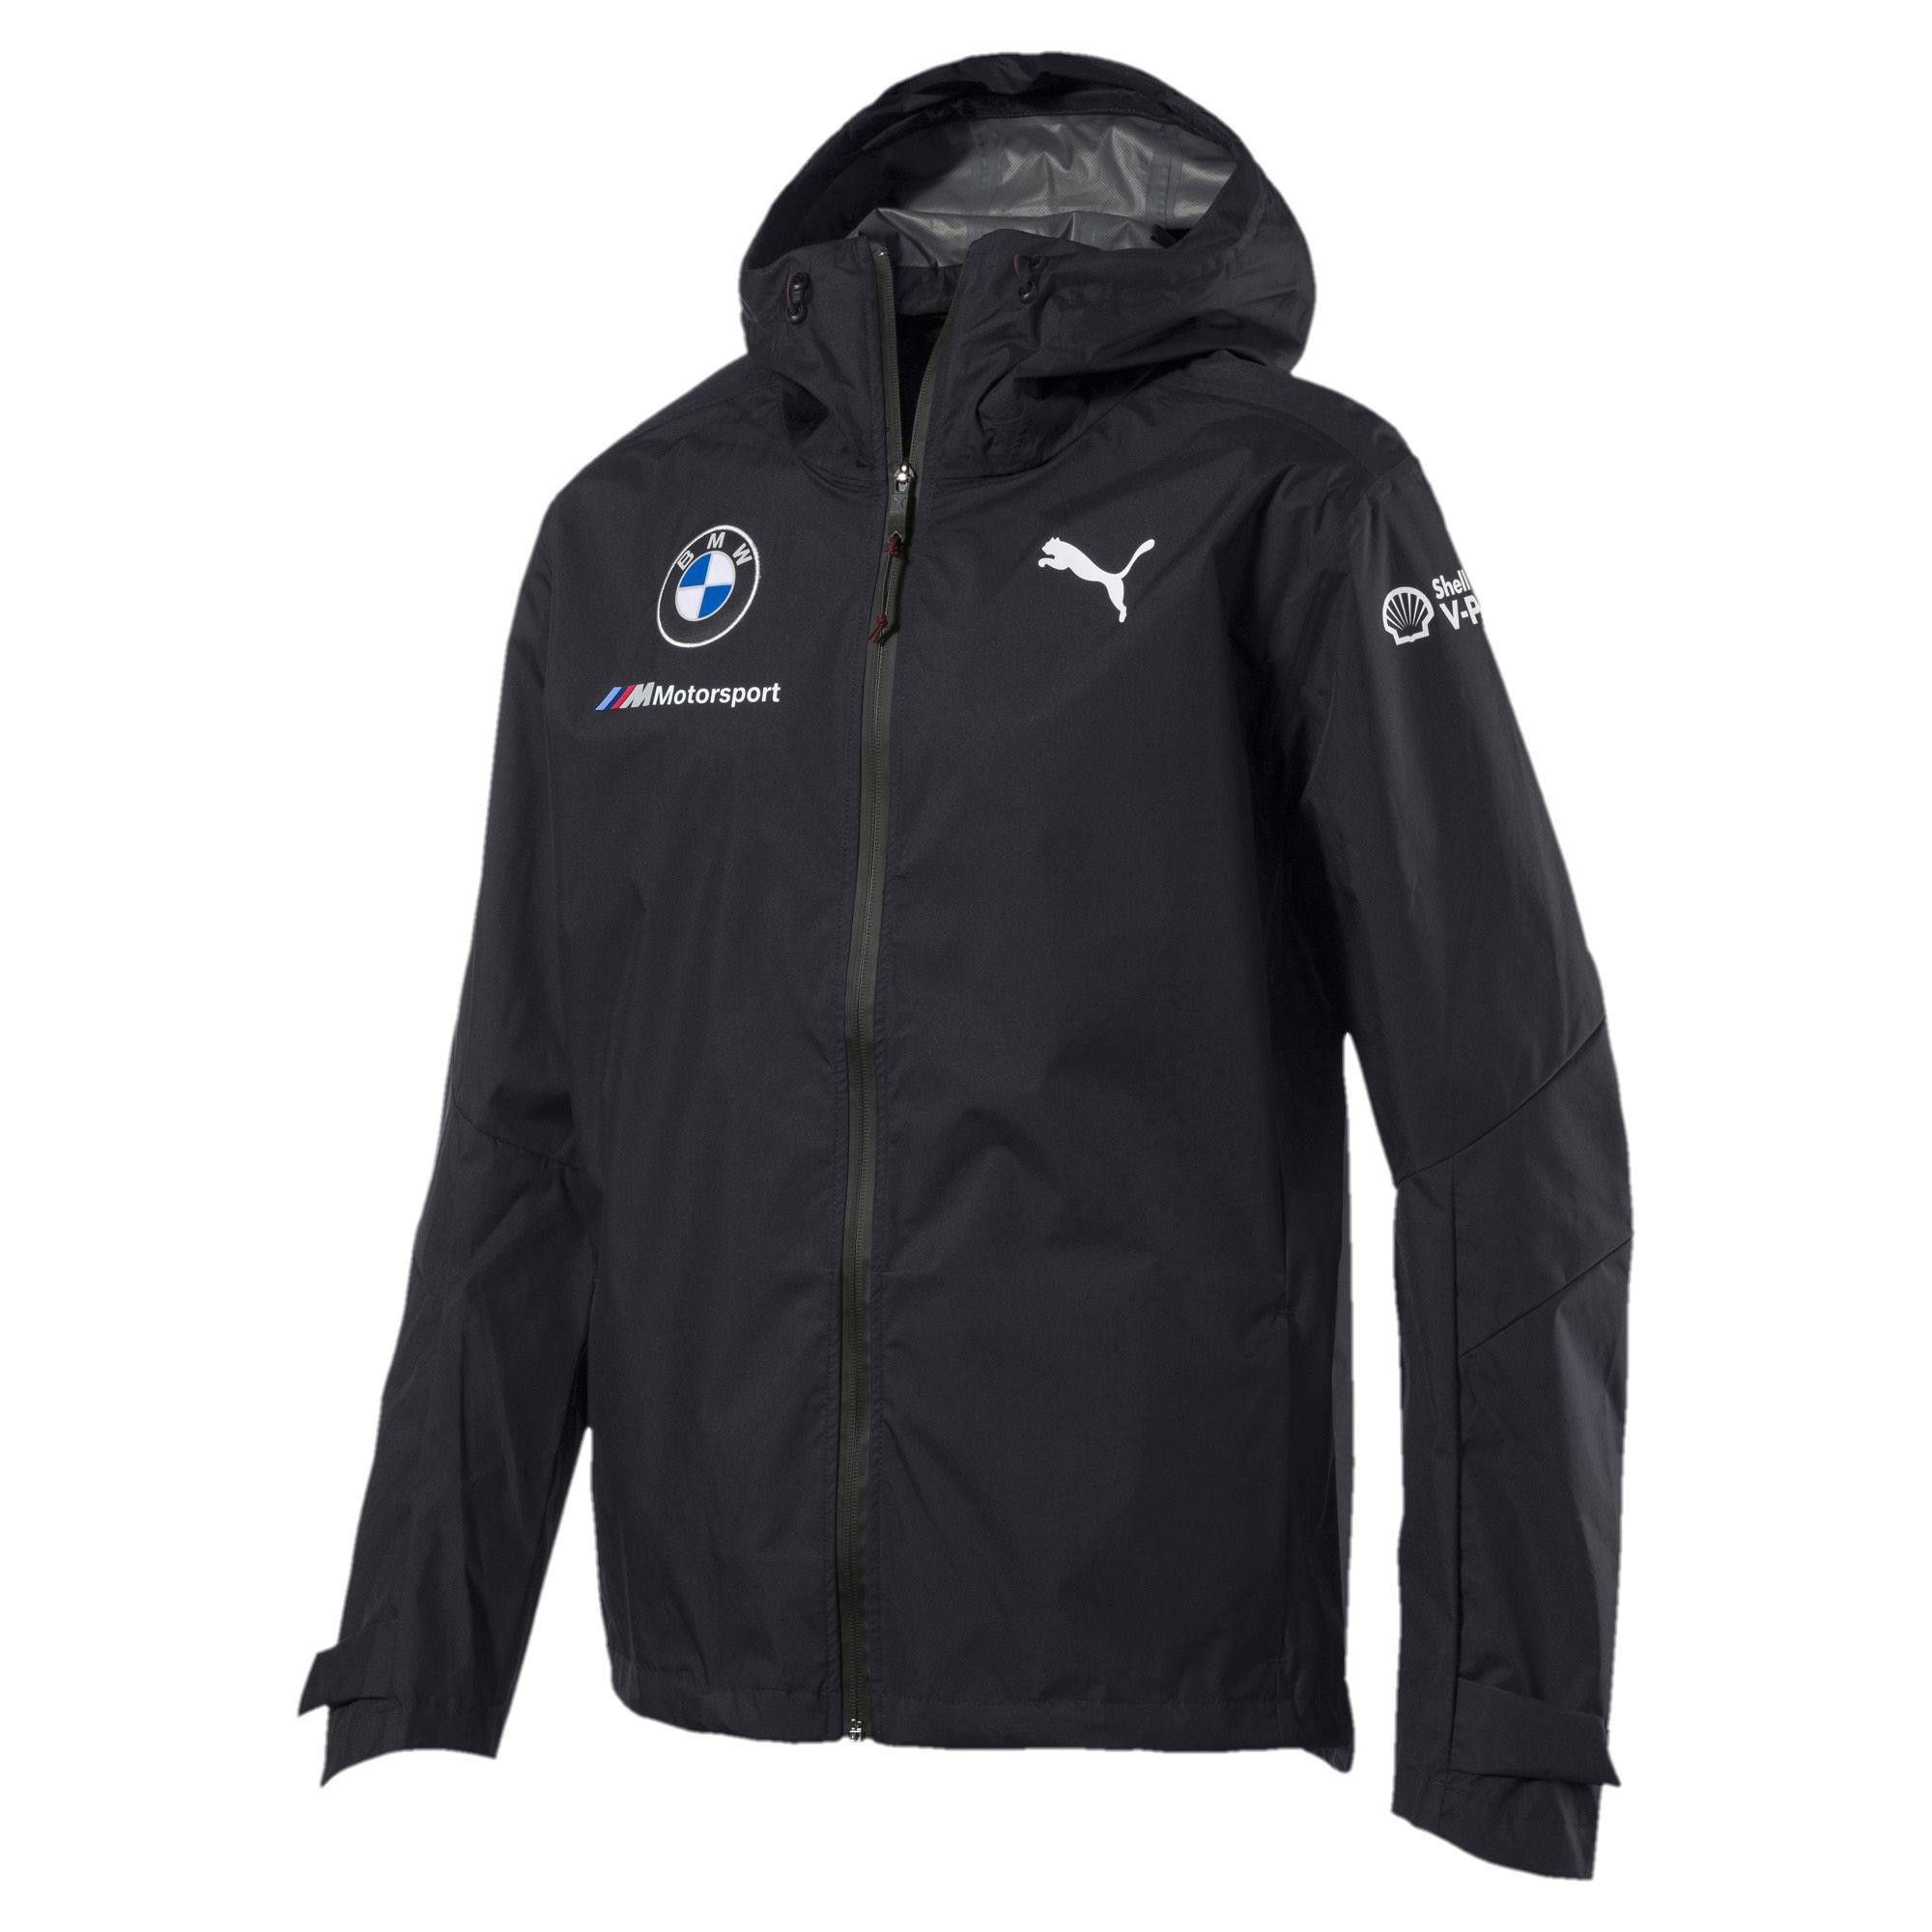 090e3665f1e7 BMW Motorsports Puma Team Jacket